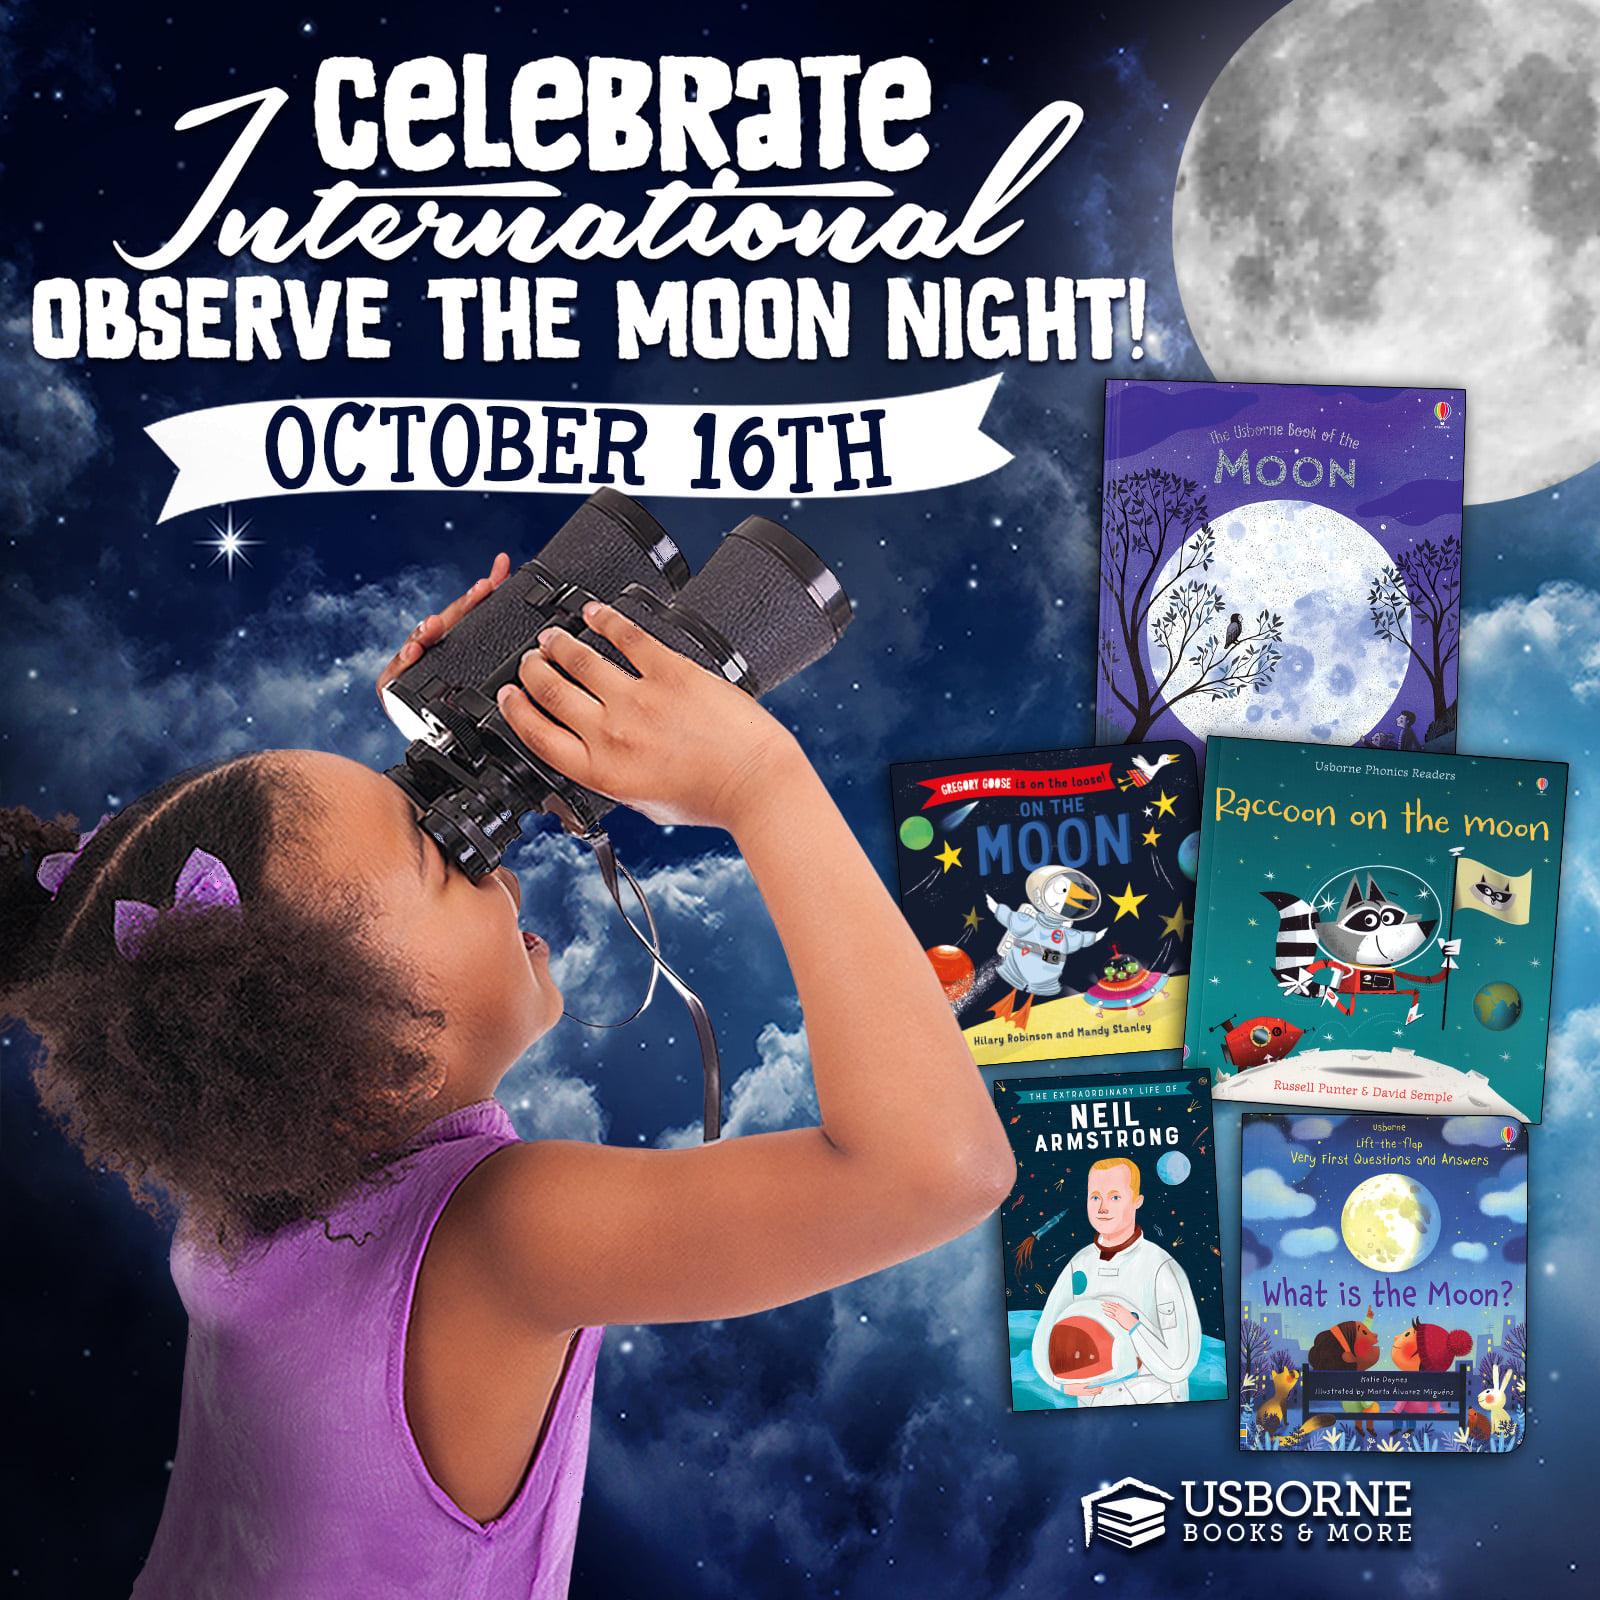 International Observe the Moon Night ~ October 16